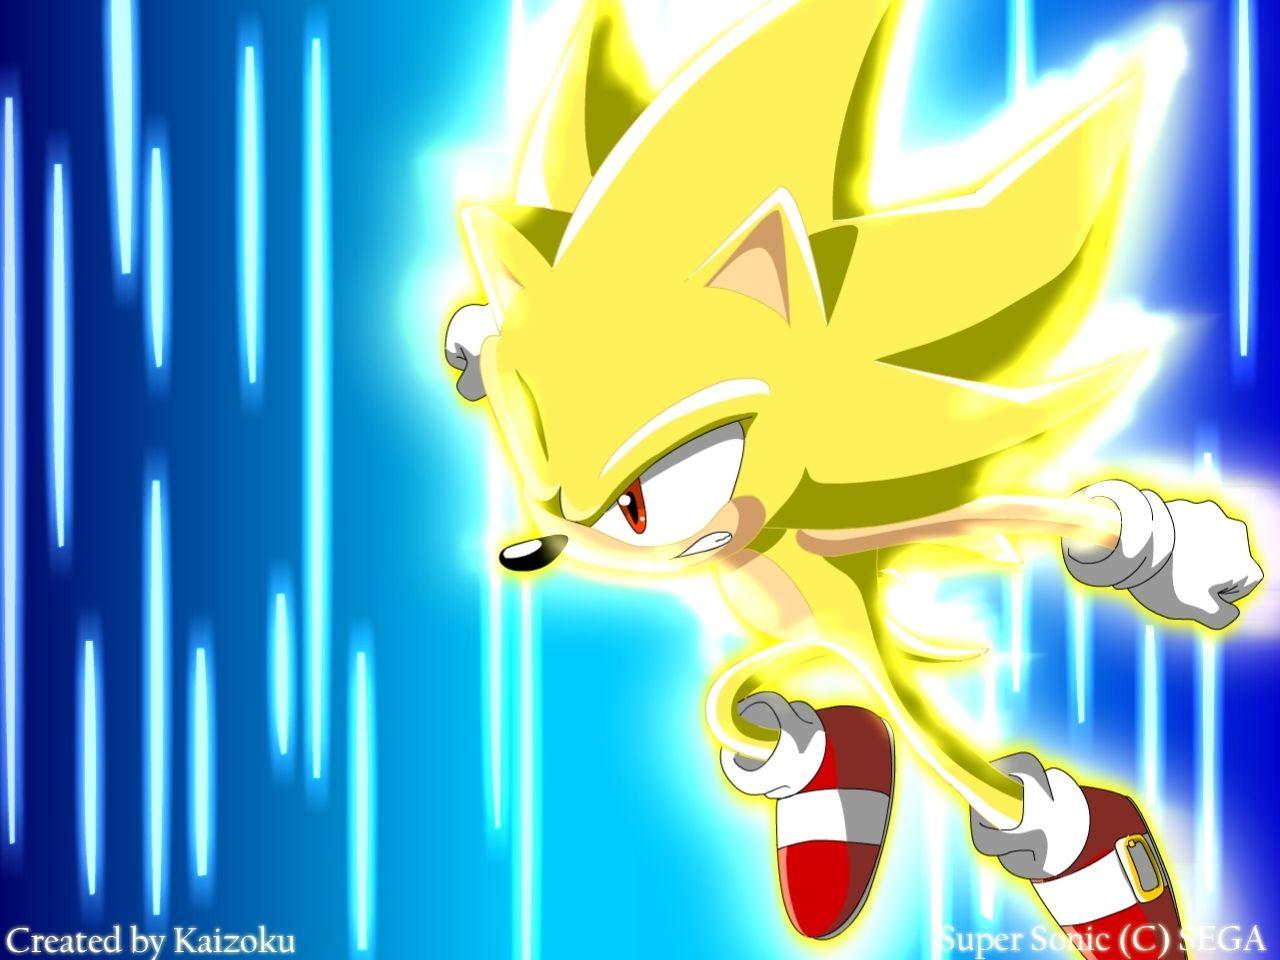 Super Sonic X Fanpop 445966 Hd Desktop Backgrounds Wallpaper Sonic Sonic The Hedgehog Sonic The Hedgehog 4